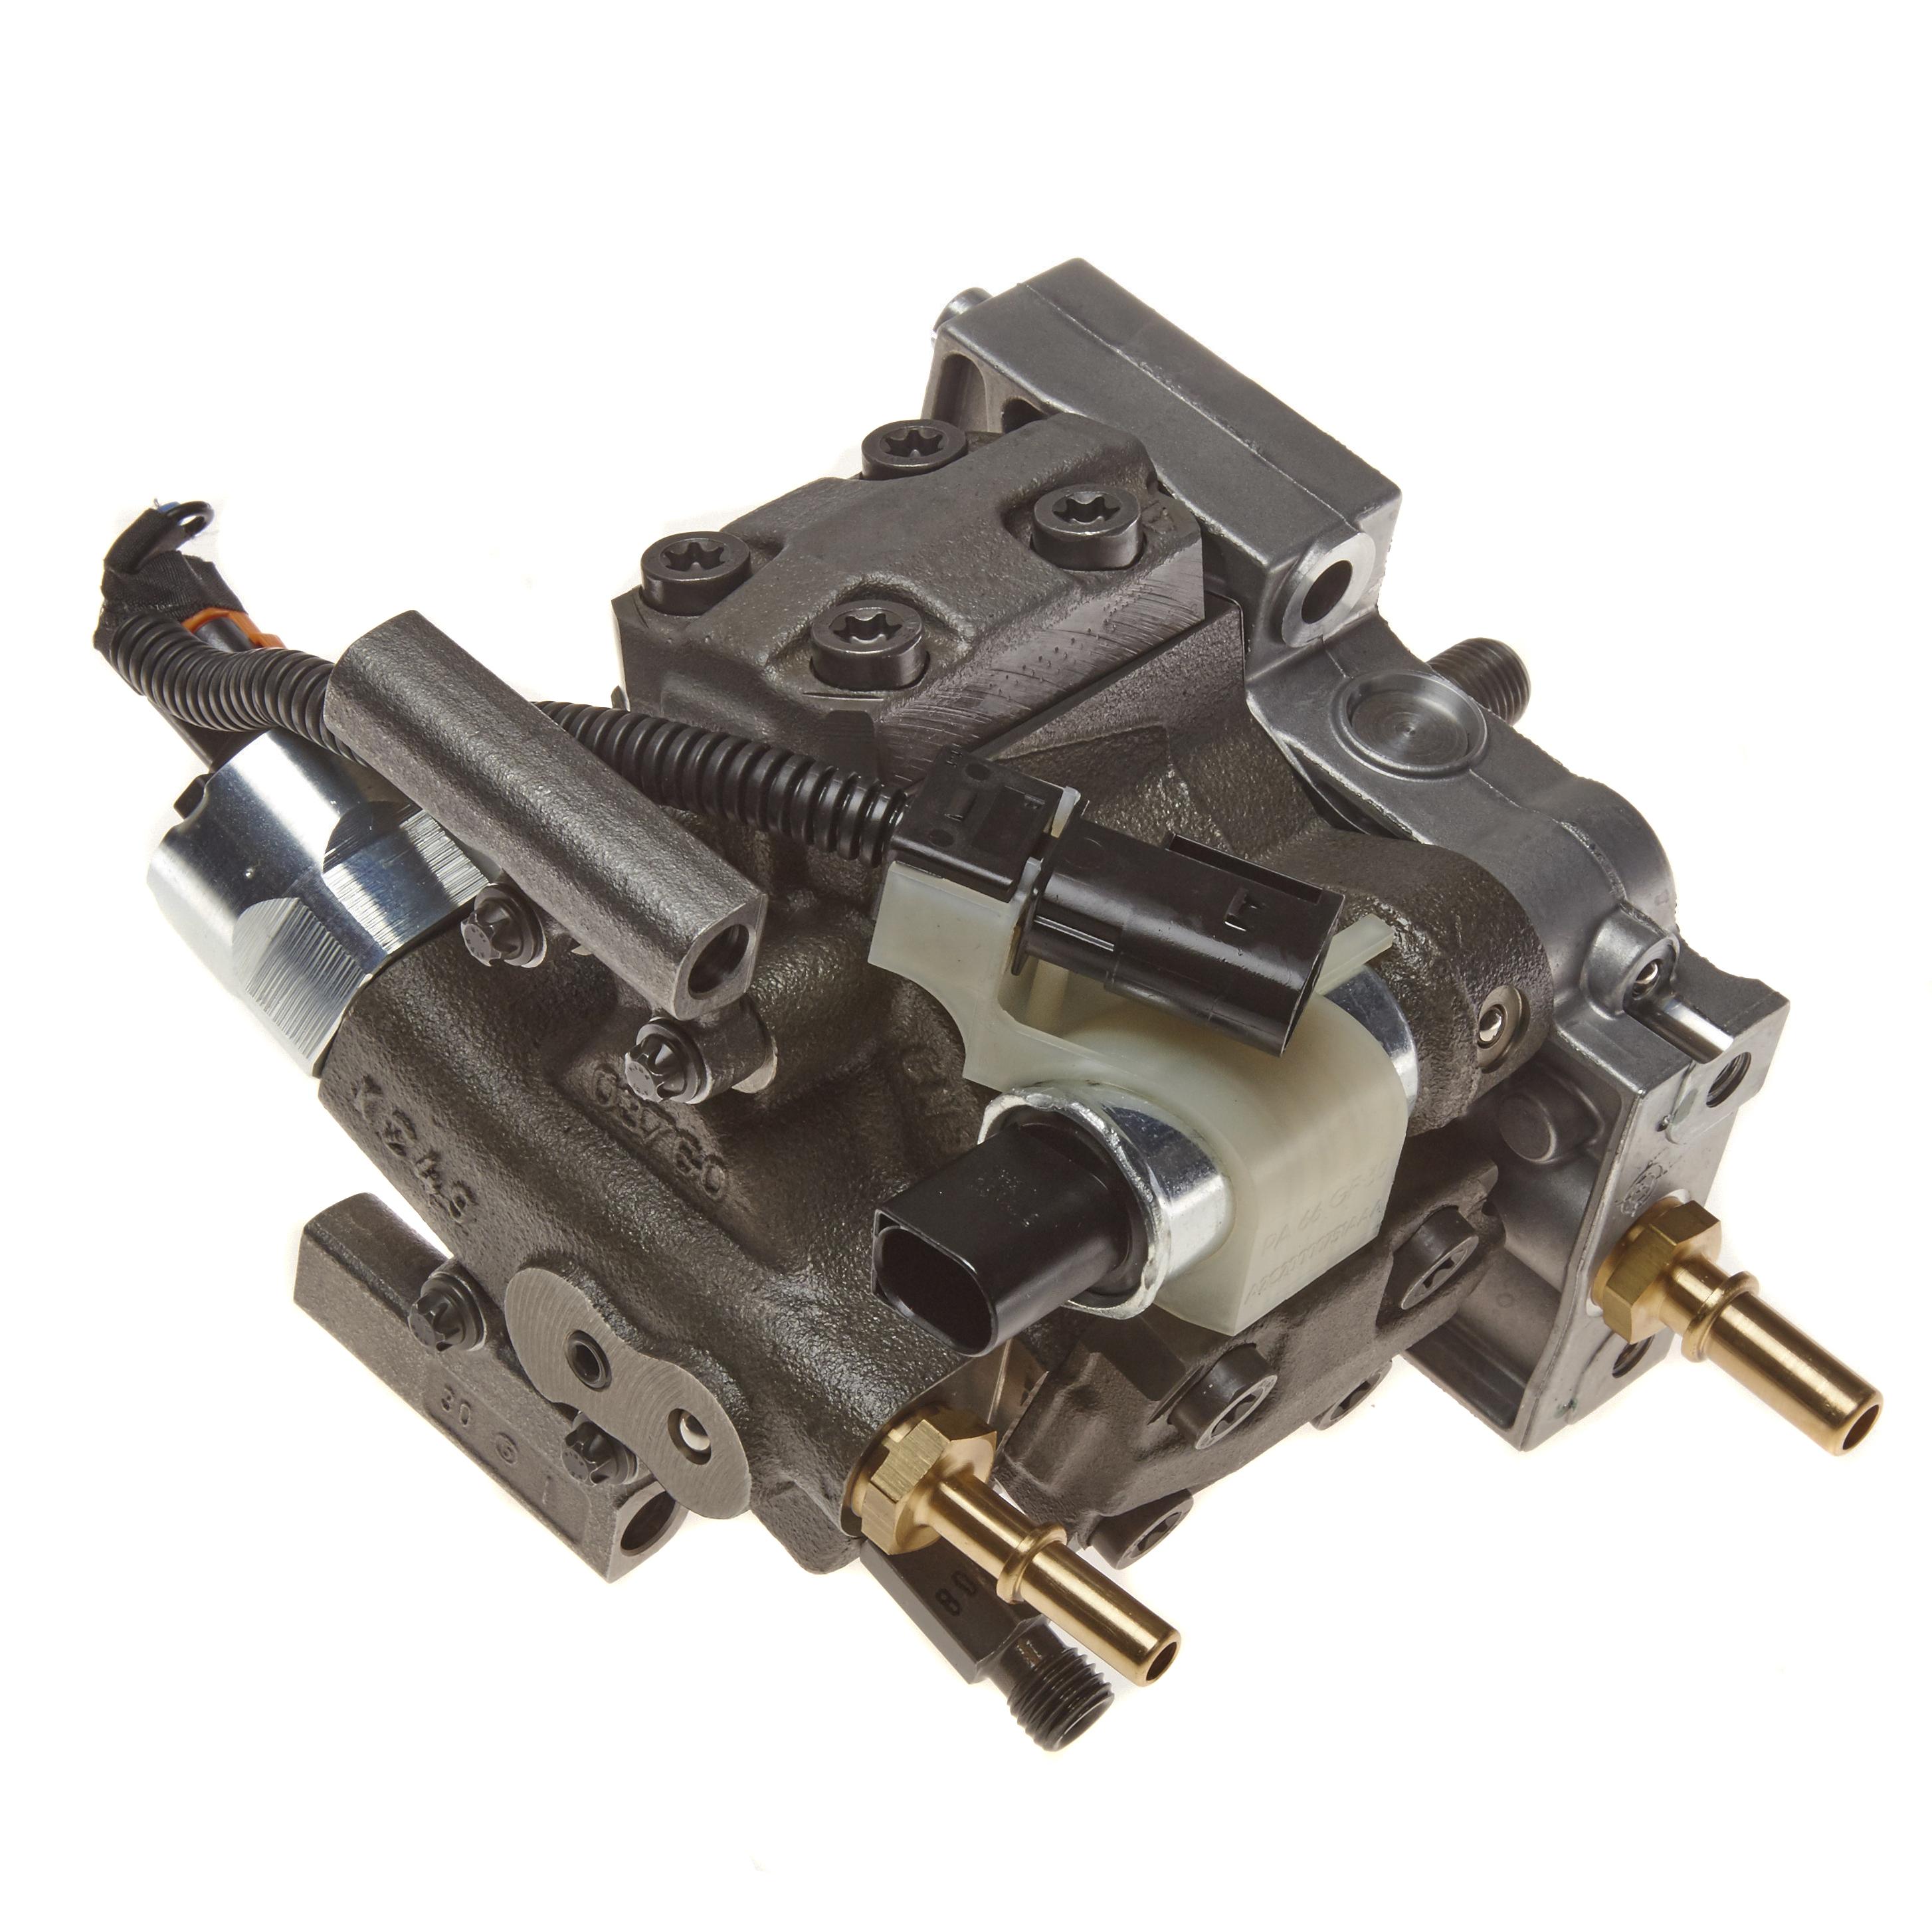 diesel fuel injection pump common rail high pressure siemens vdo a2c59511314 ebay. Black Bedroom Furniture Sets. Home Design Ideas